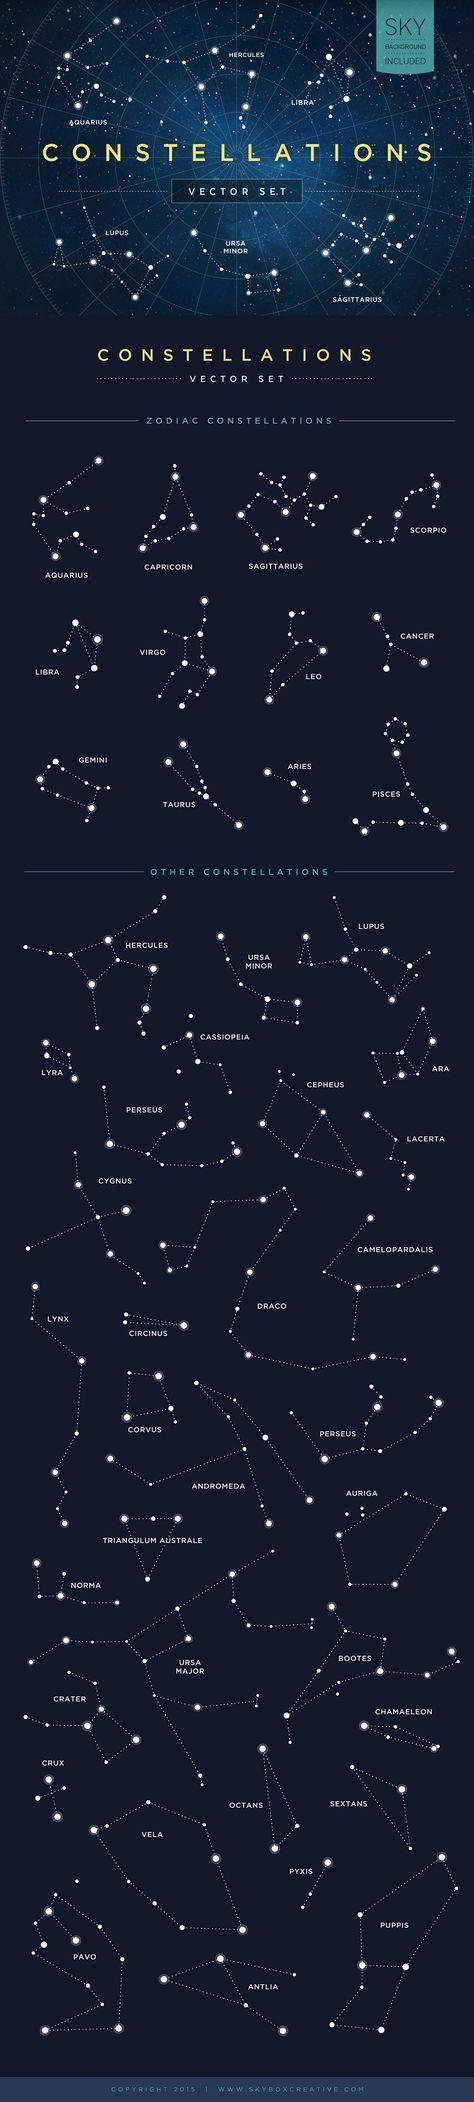 Constellations Vector Set by skyboxcreative #Illustration #Constellation tatuajes   Spanish tatuajes  tatuajes para mujeres   tatuajes para hombres   diseños de tatuajes http://amzn.to/28PQlav